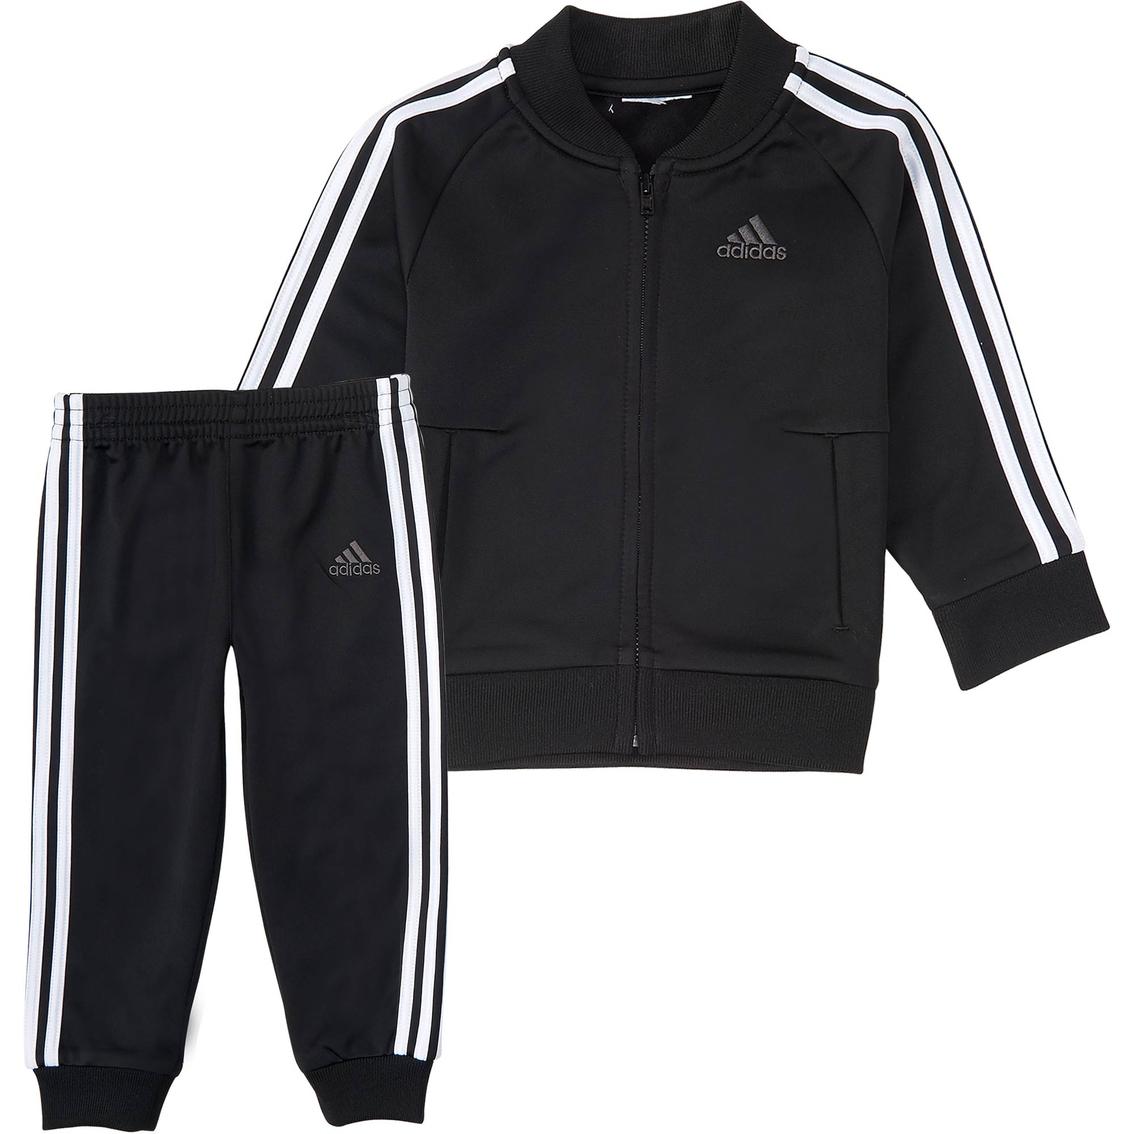 Adidas Infant Boys All Sport Set | Baby Boy 0 24 Months